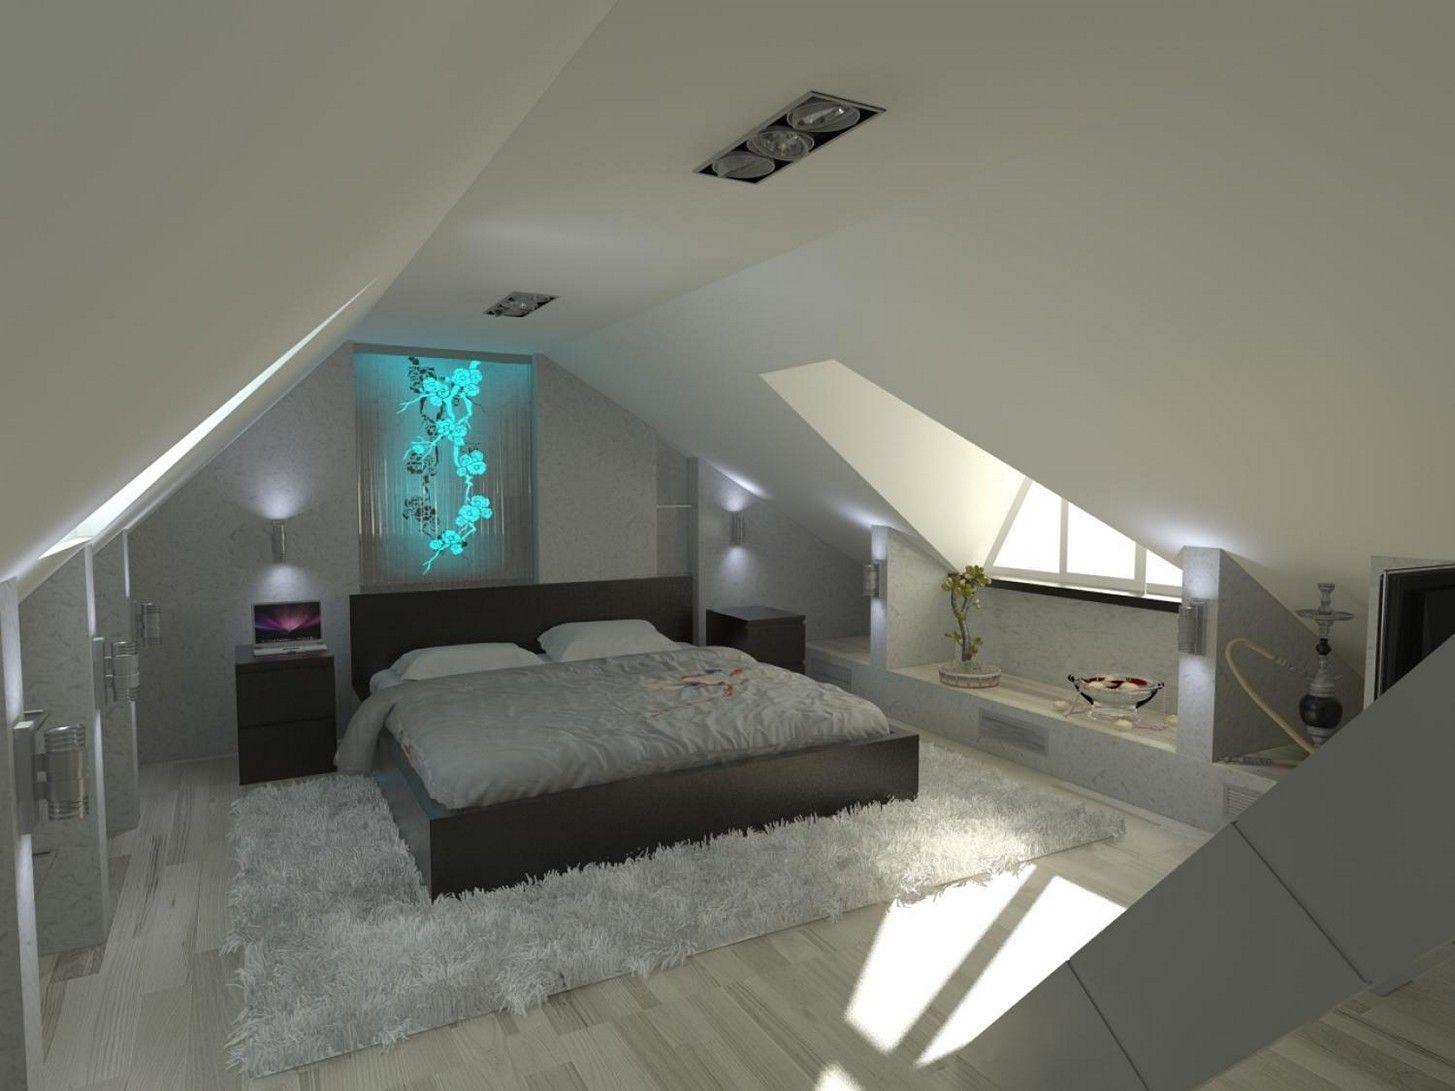 Attic Bedroom Paint Attic Bedroom Design And Decor Tips Small Loft Bedroom Attic Bedroom Designs Attic Bedroom Small